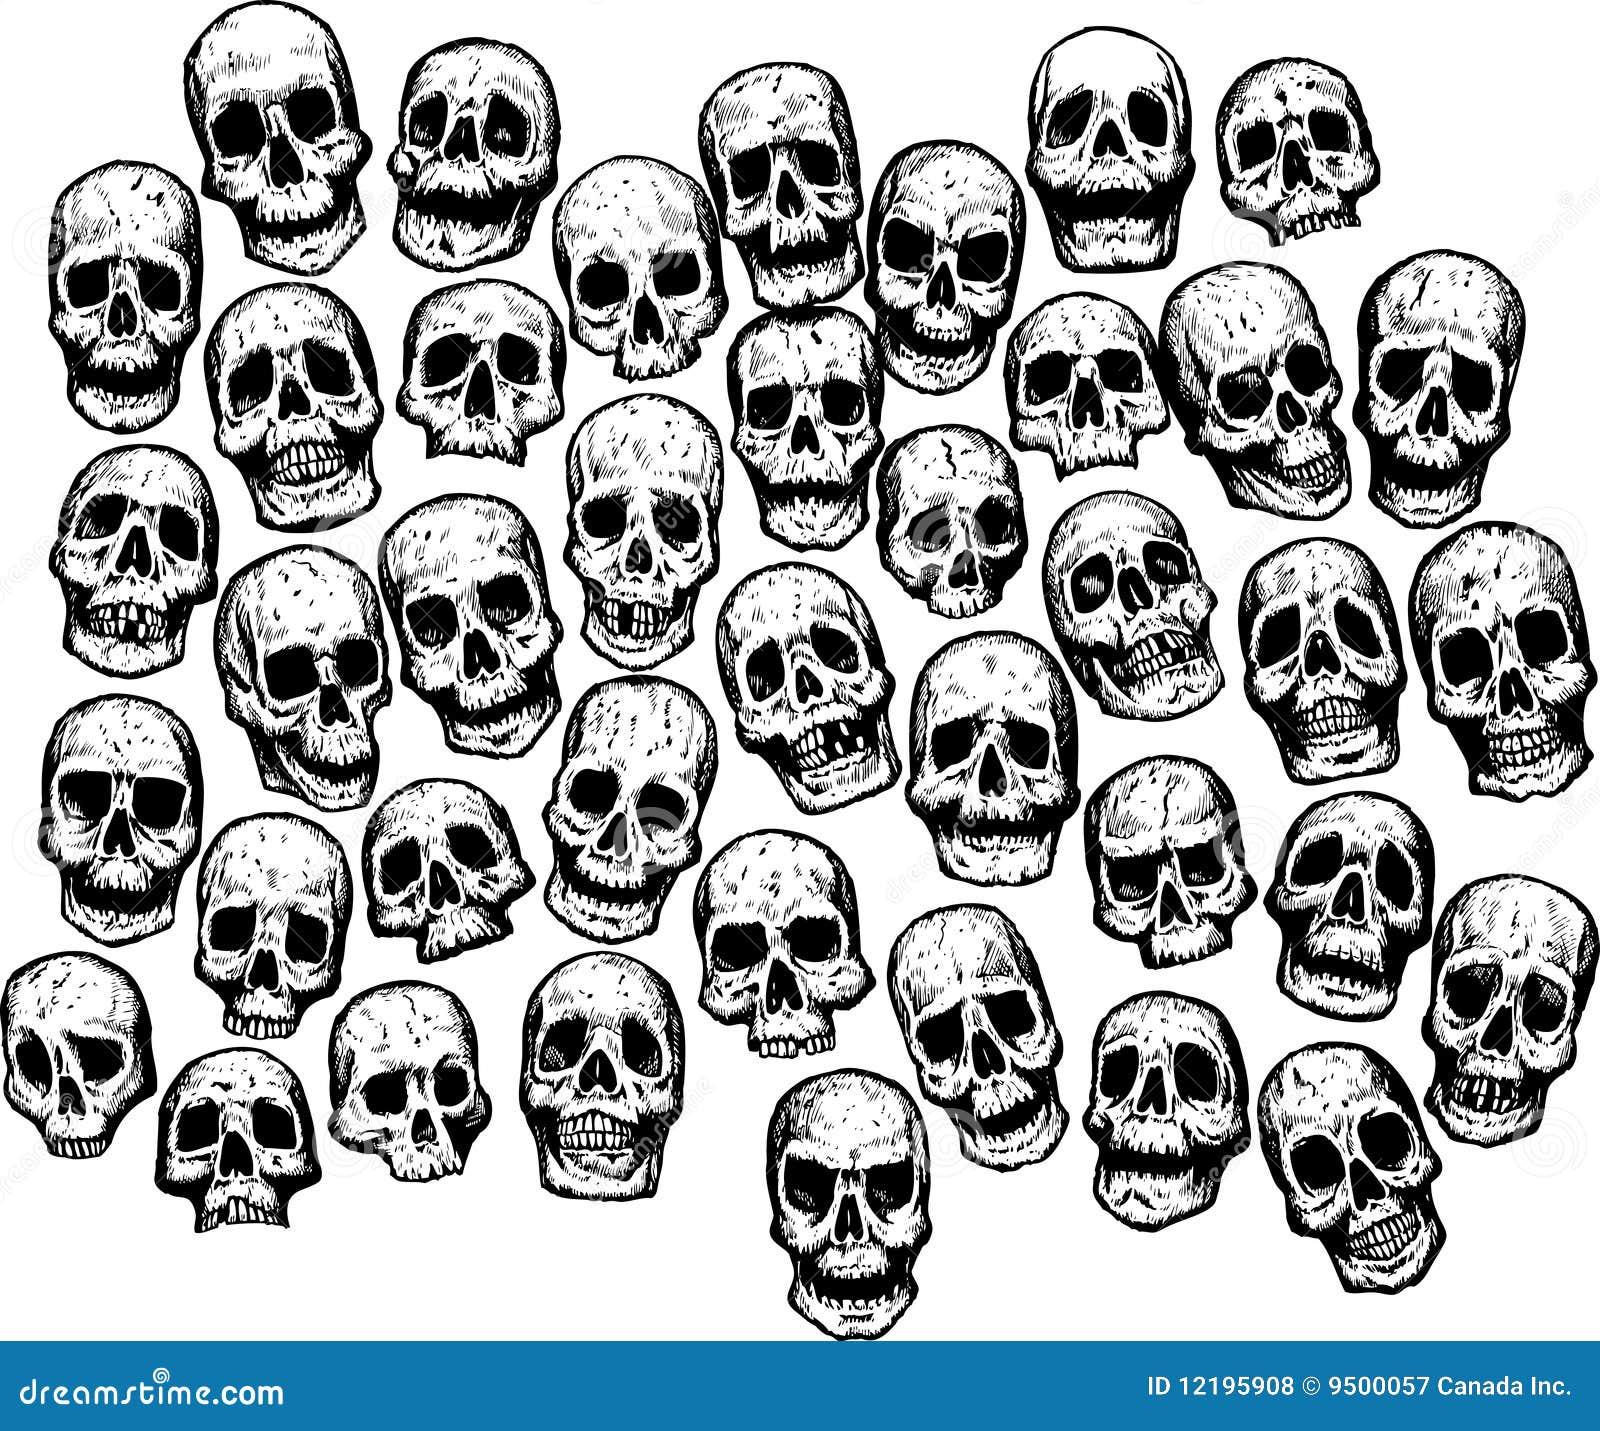 Multiple Skulls Royalty Free Stock Photos Image 12195908